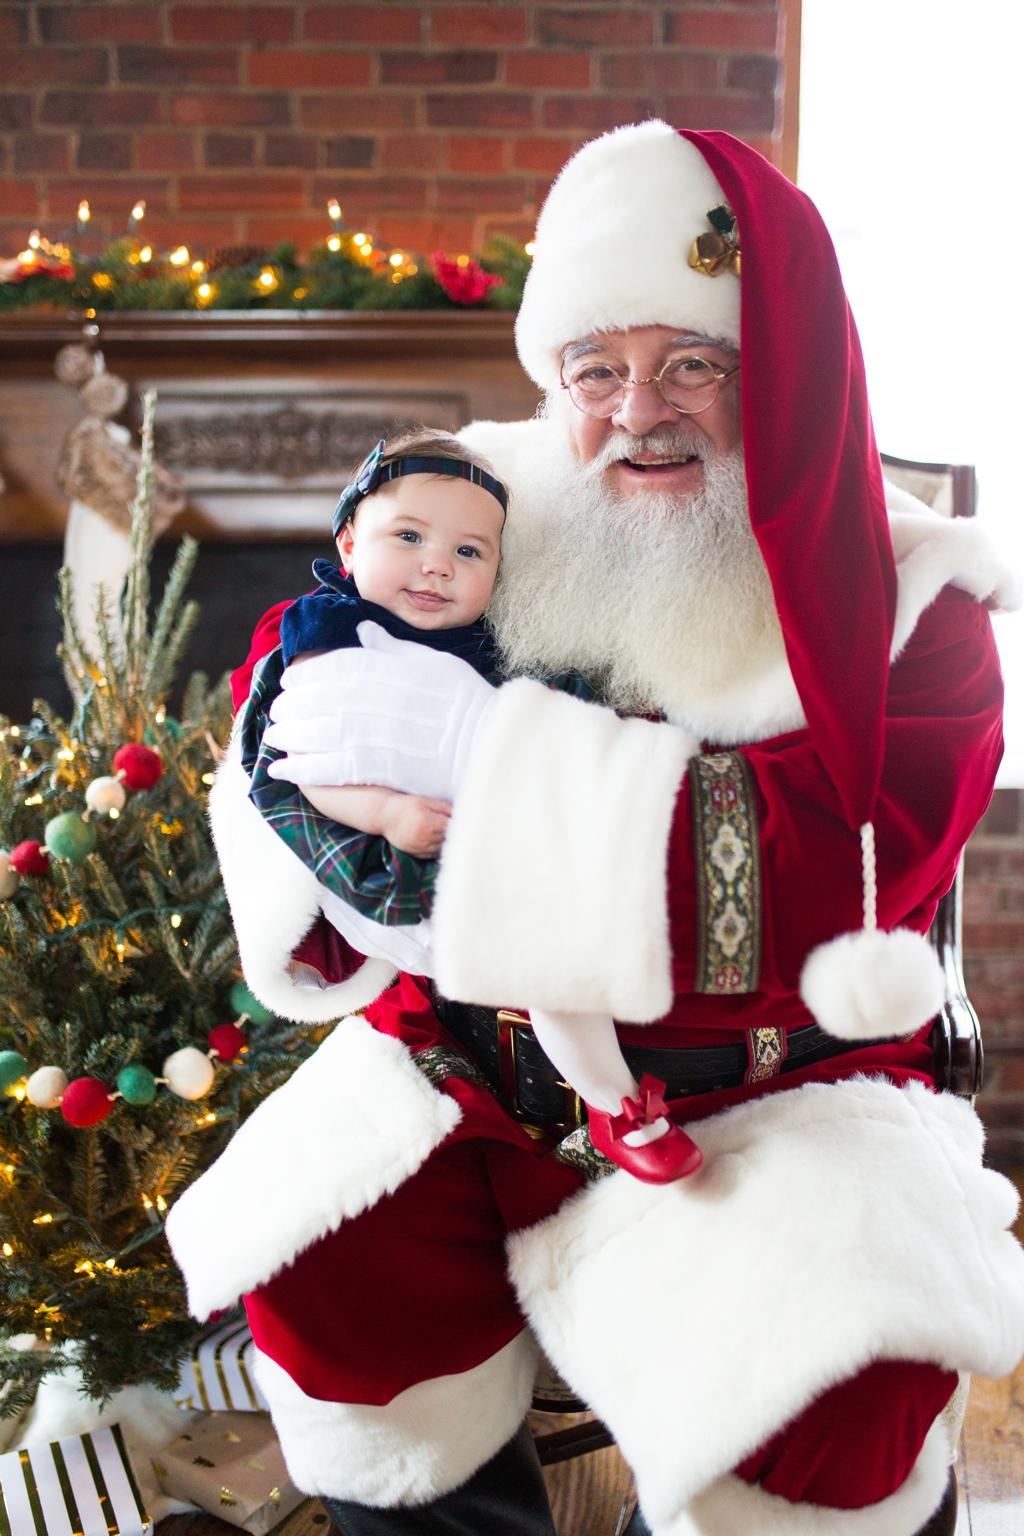 ways to make christmas less stressful next year